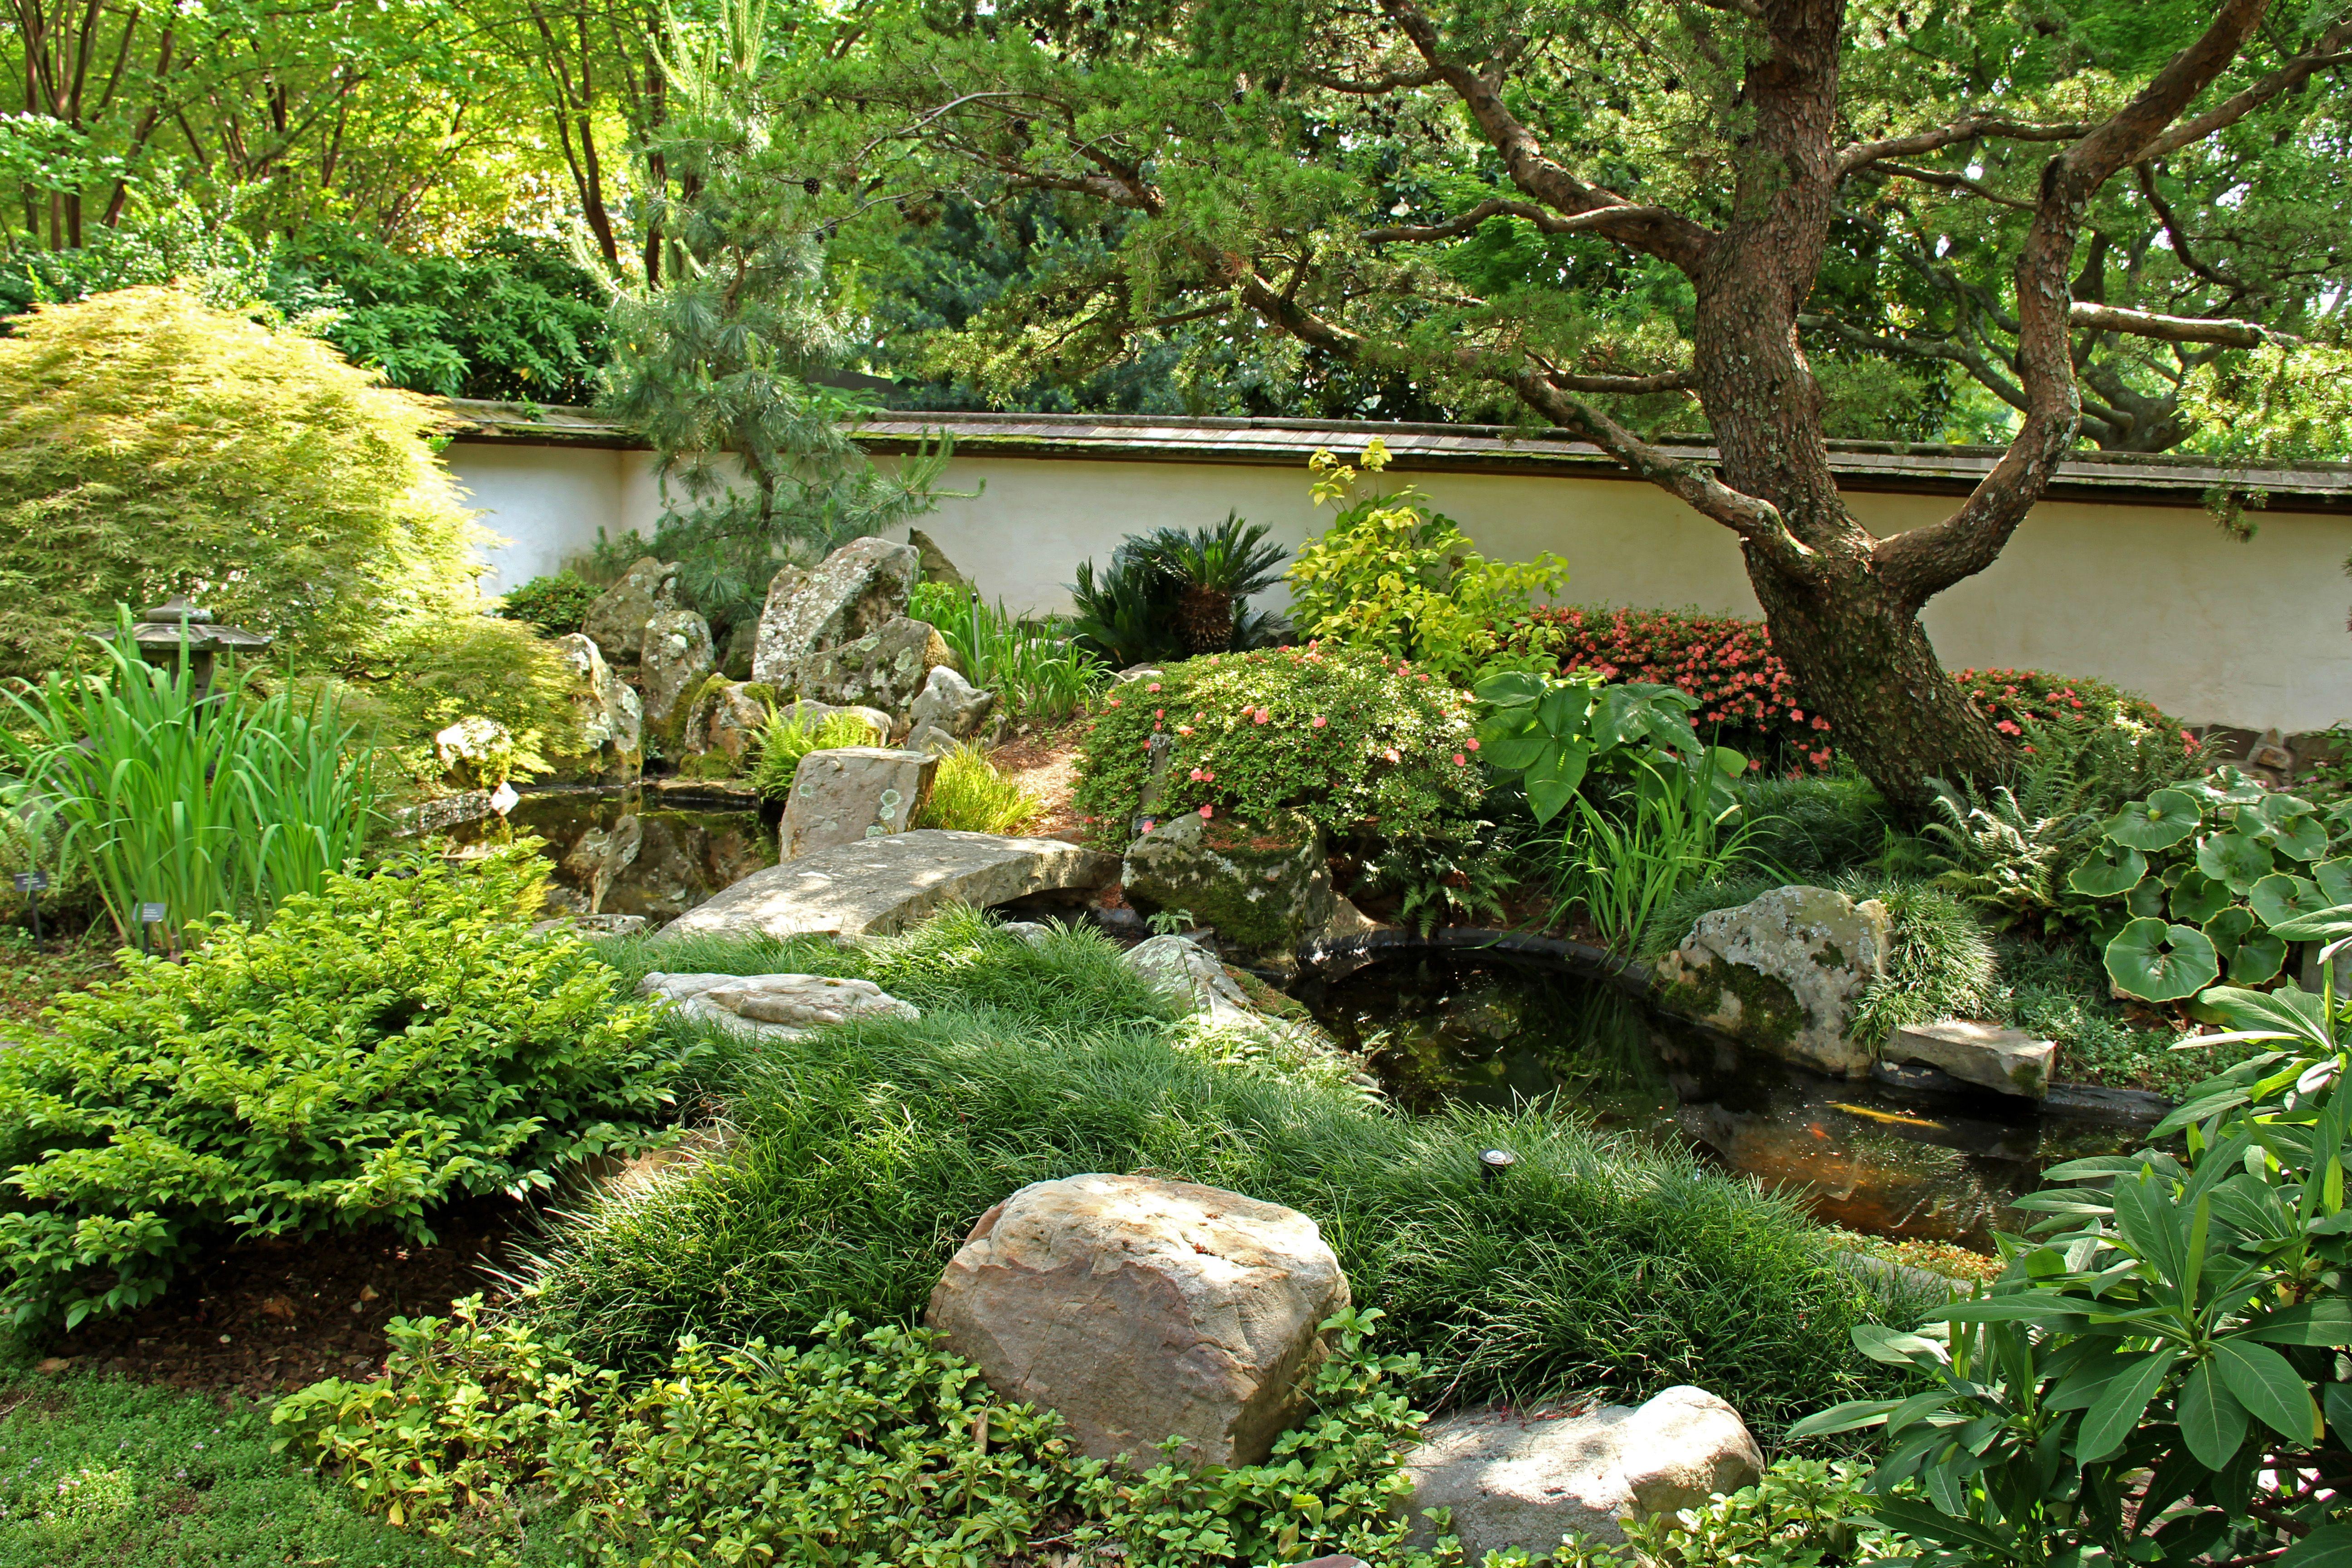 The Beautiful Japanese Garden At The Atlanta Botanical Garden